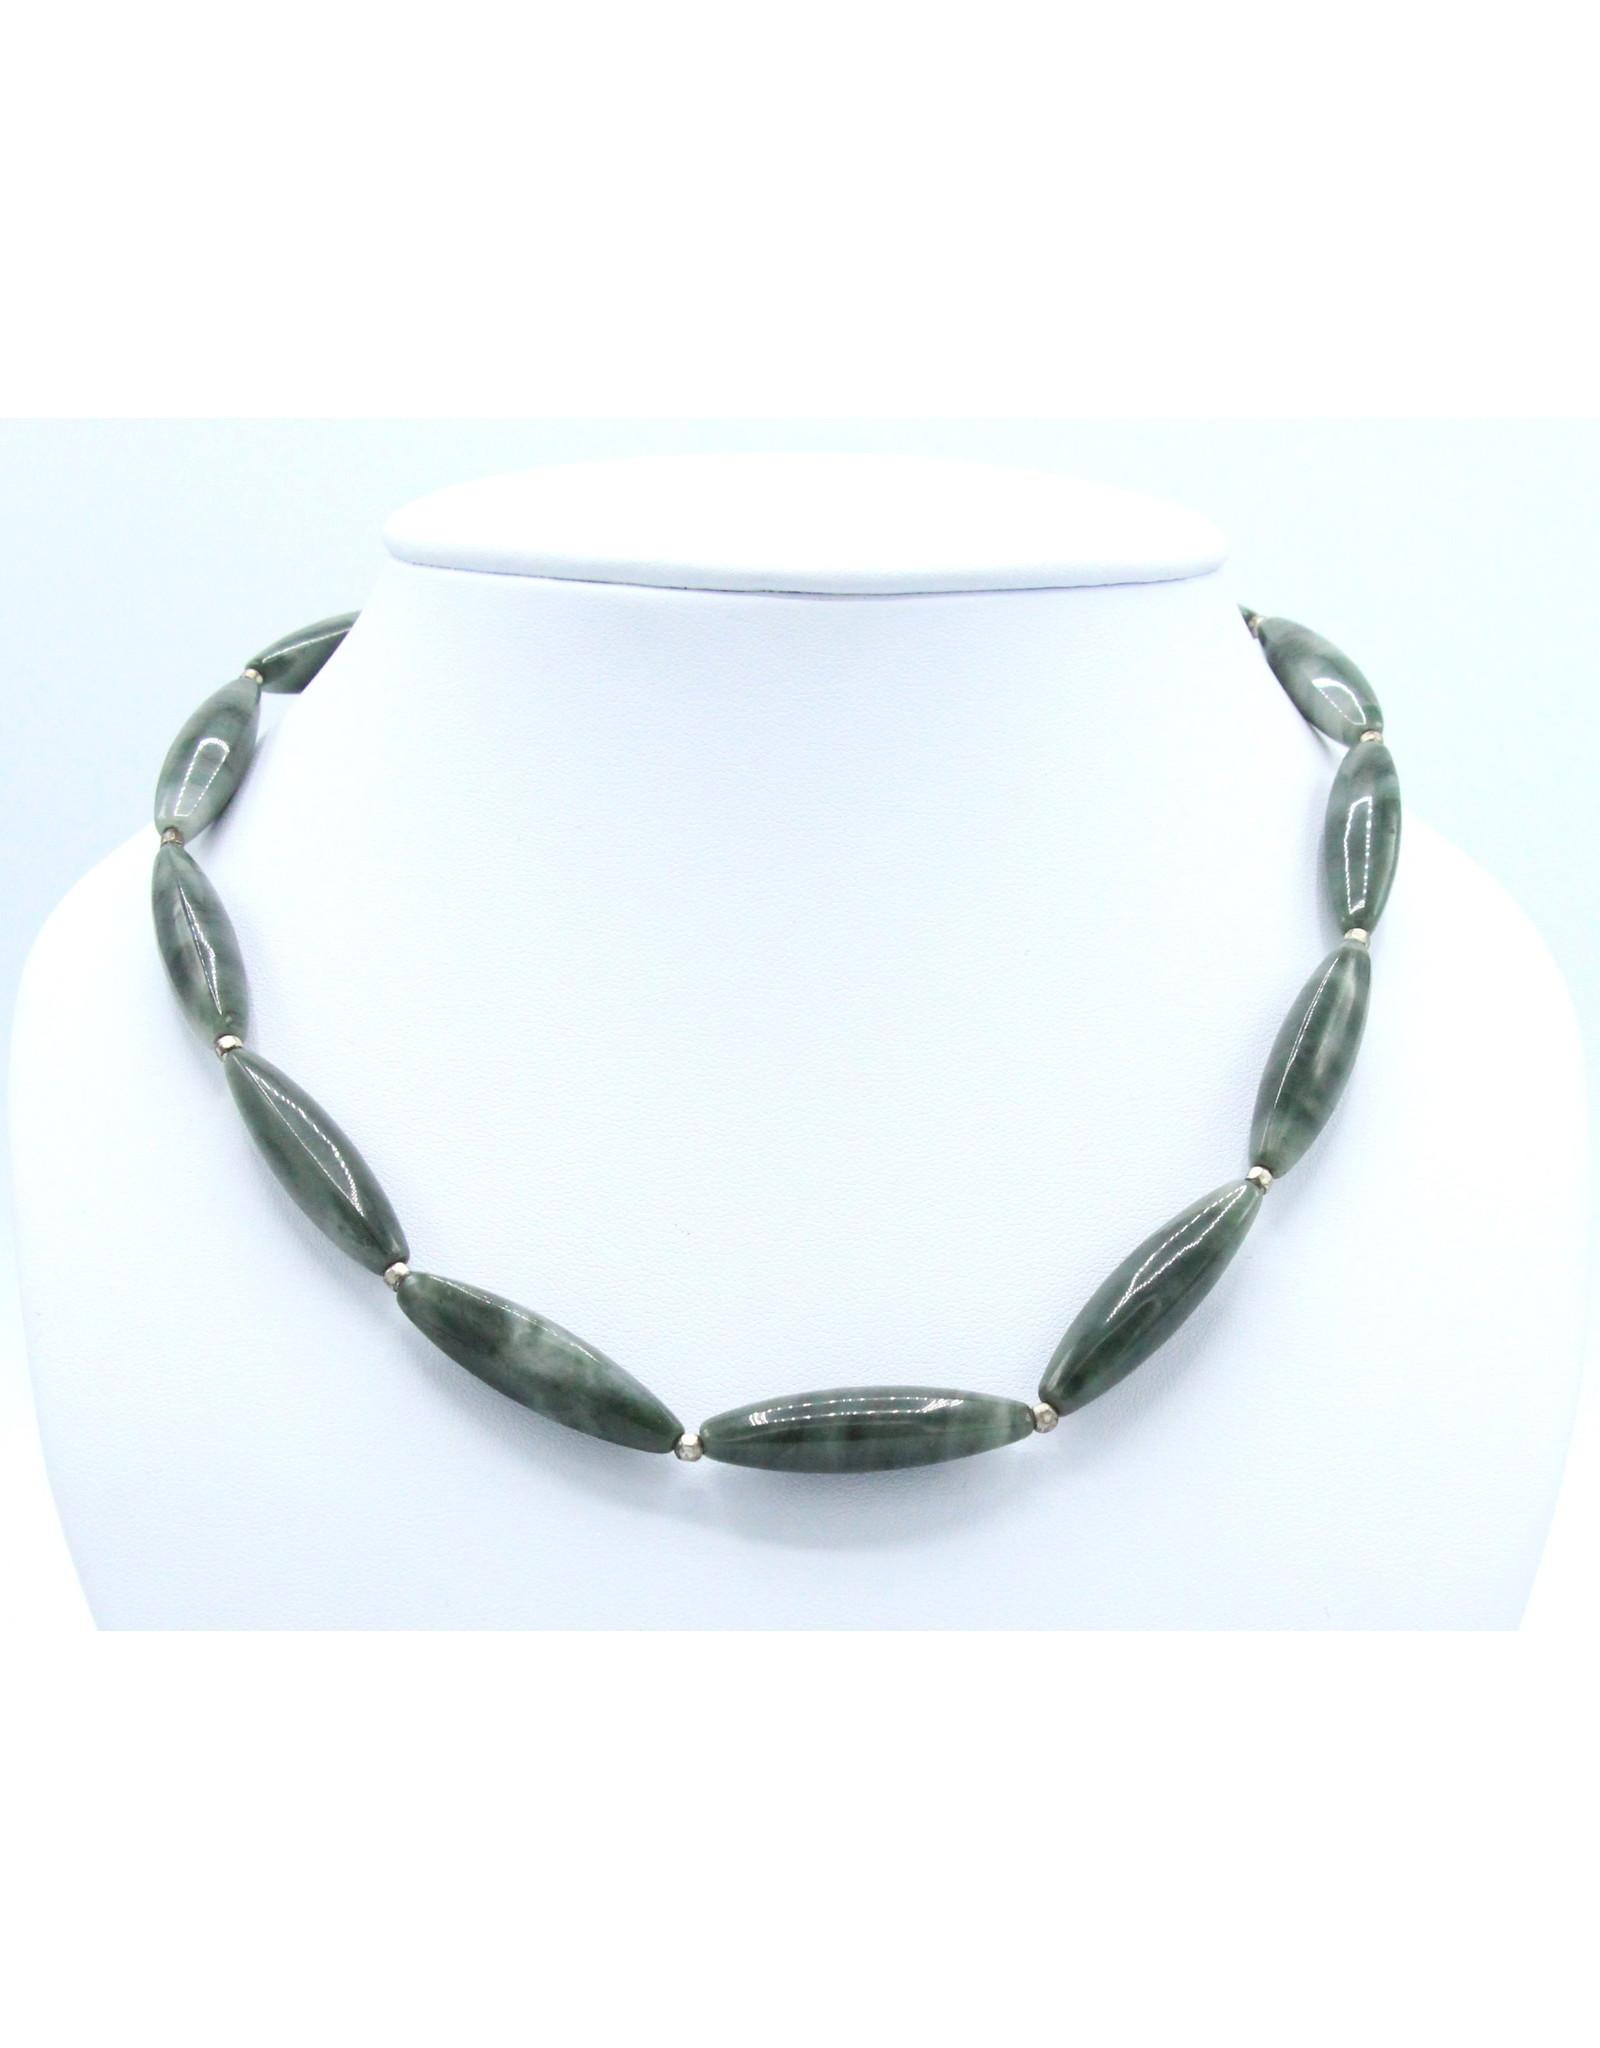 Agate Mousse Necklace - NAGM01